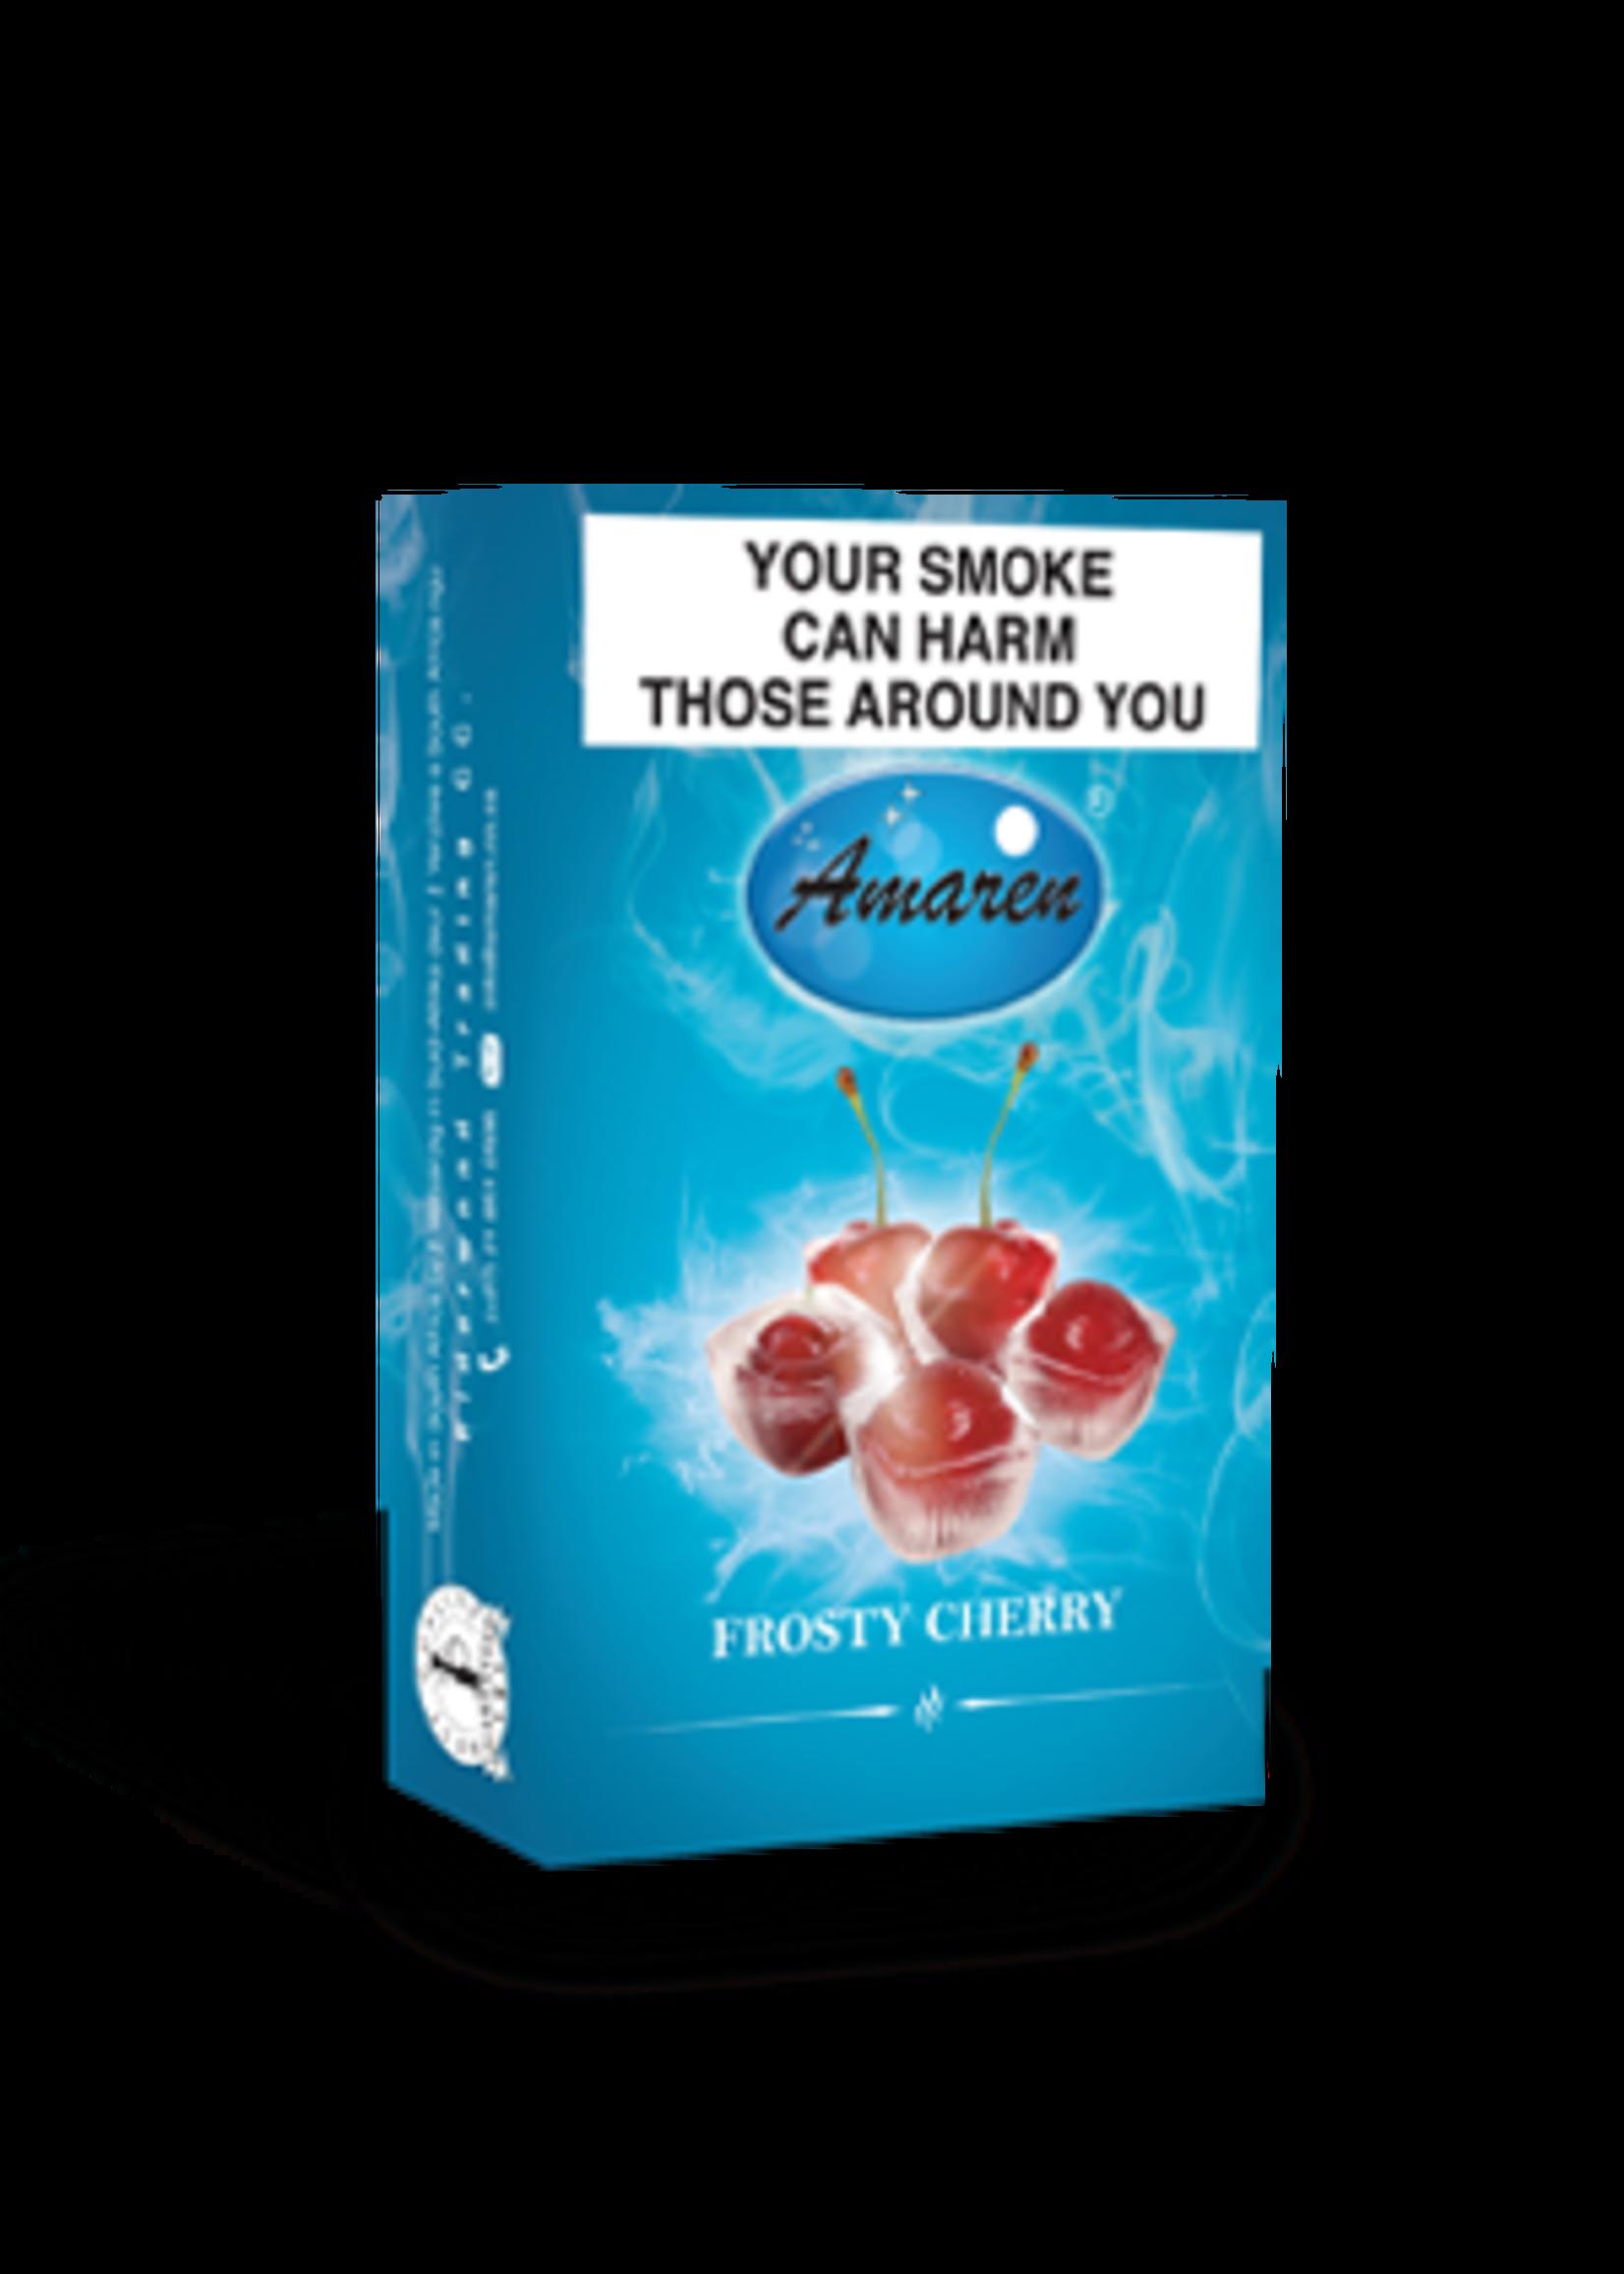 Amaren hubbly flavour - frosty cherry